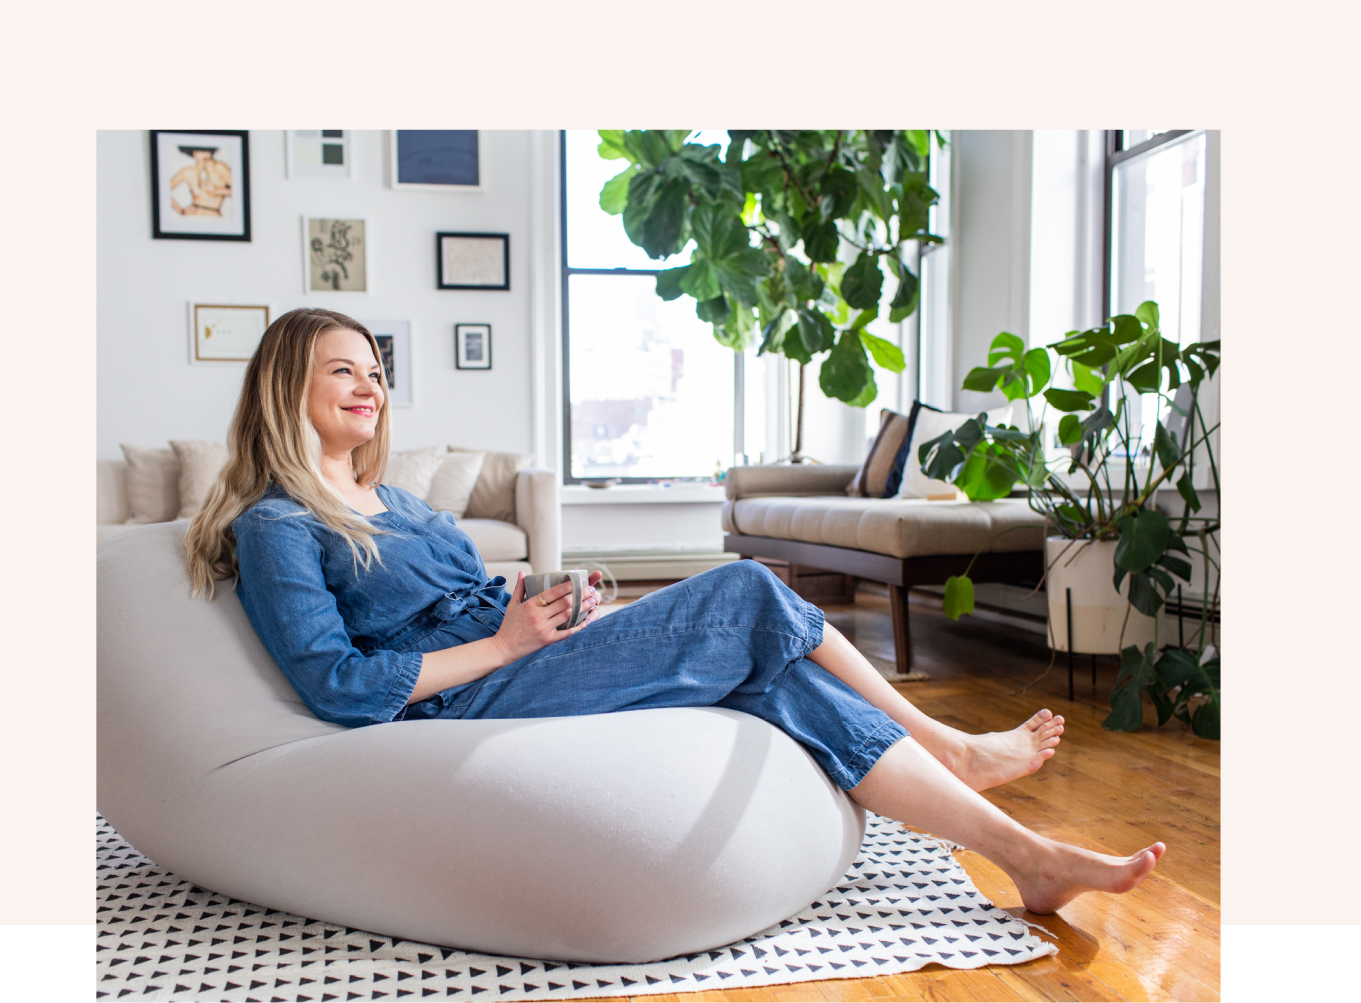 moonpod anti-anxiety chair